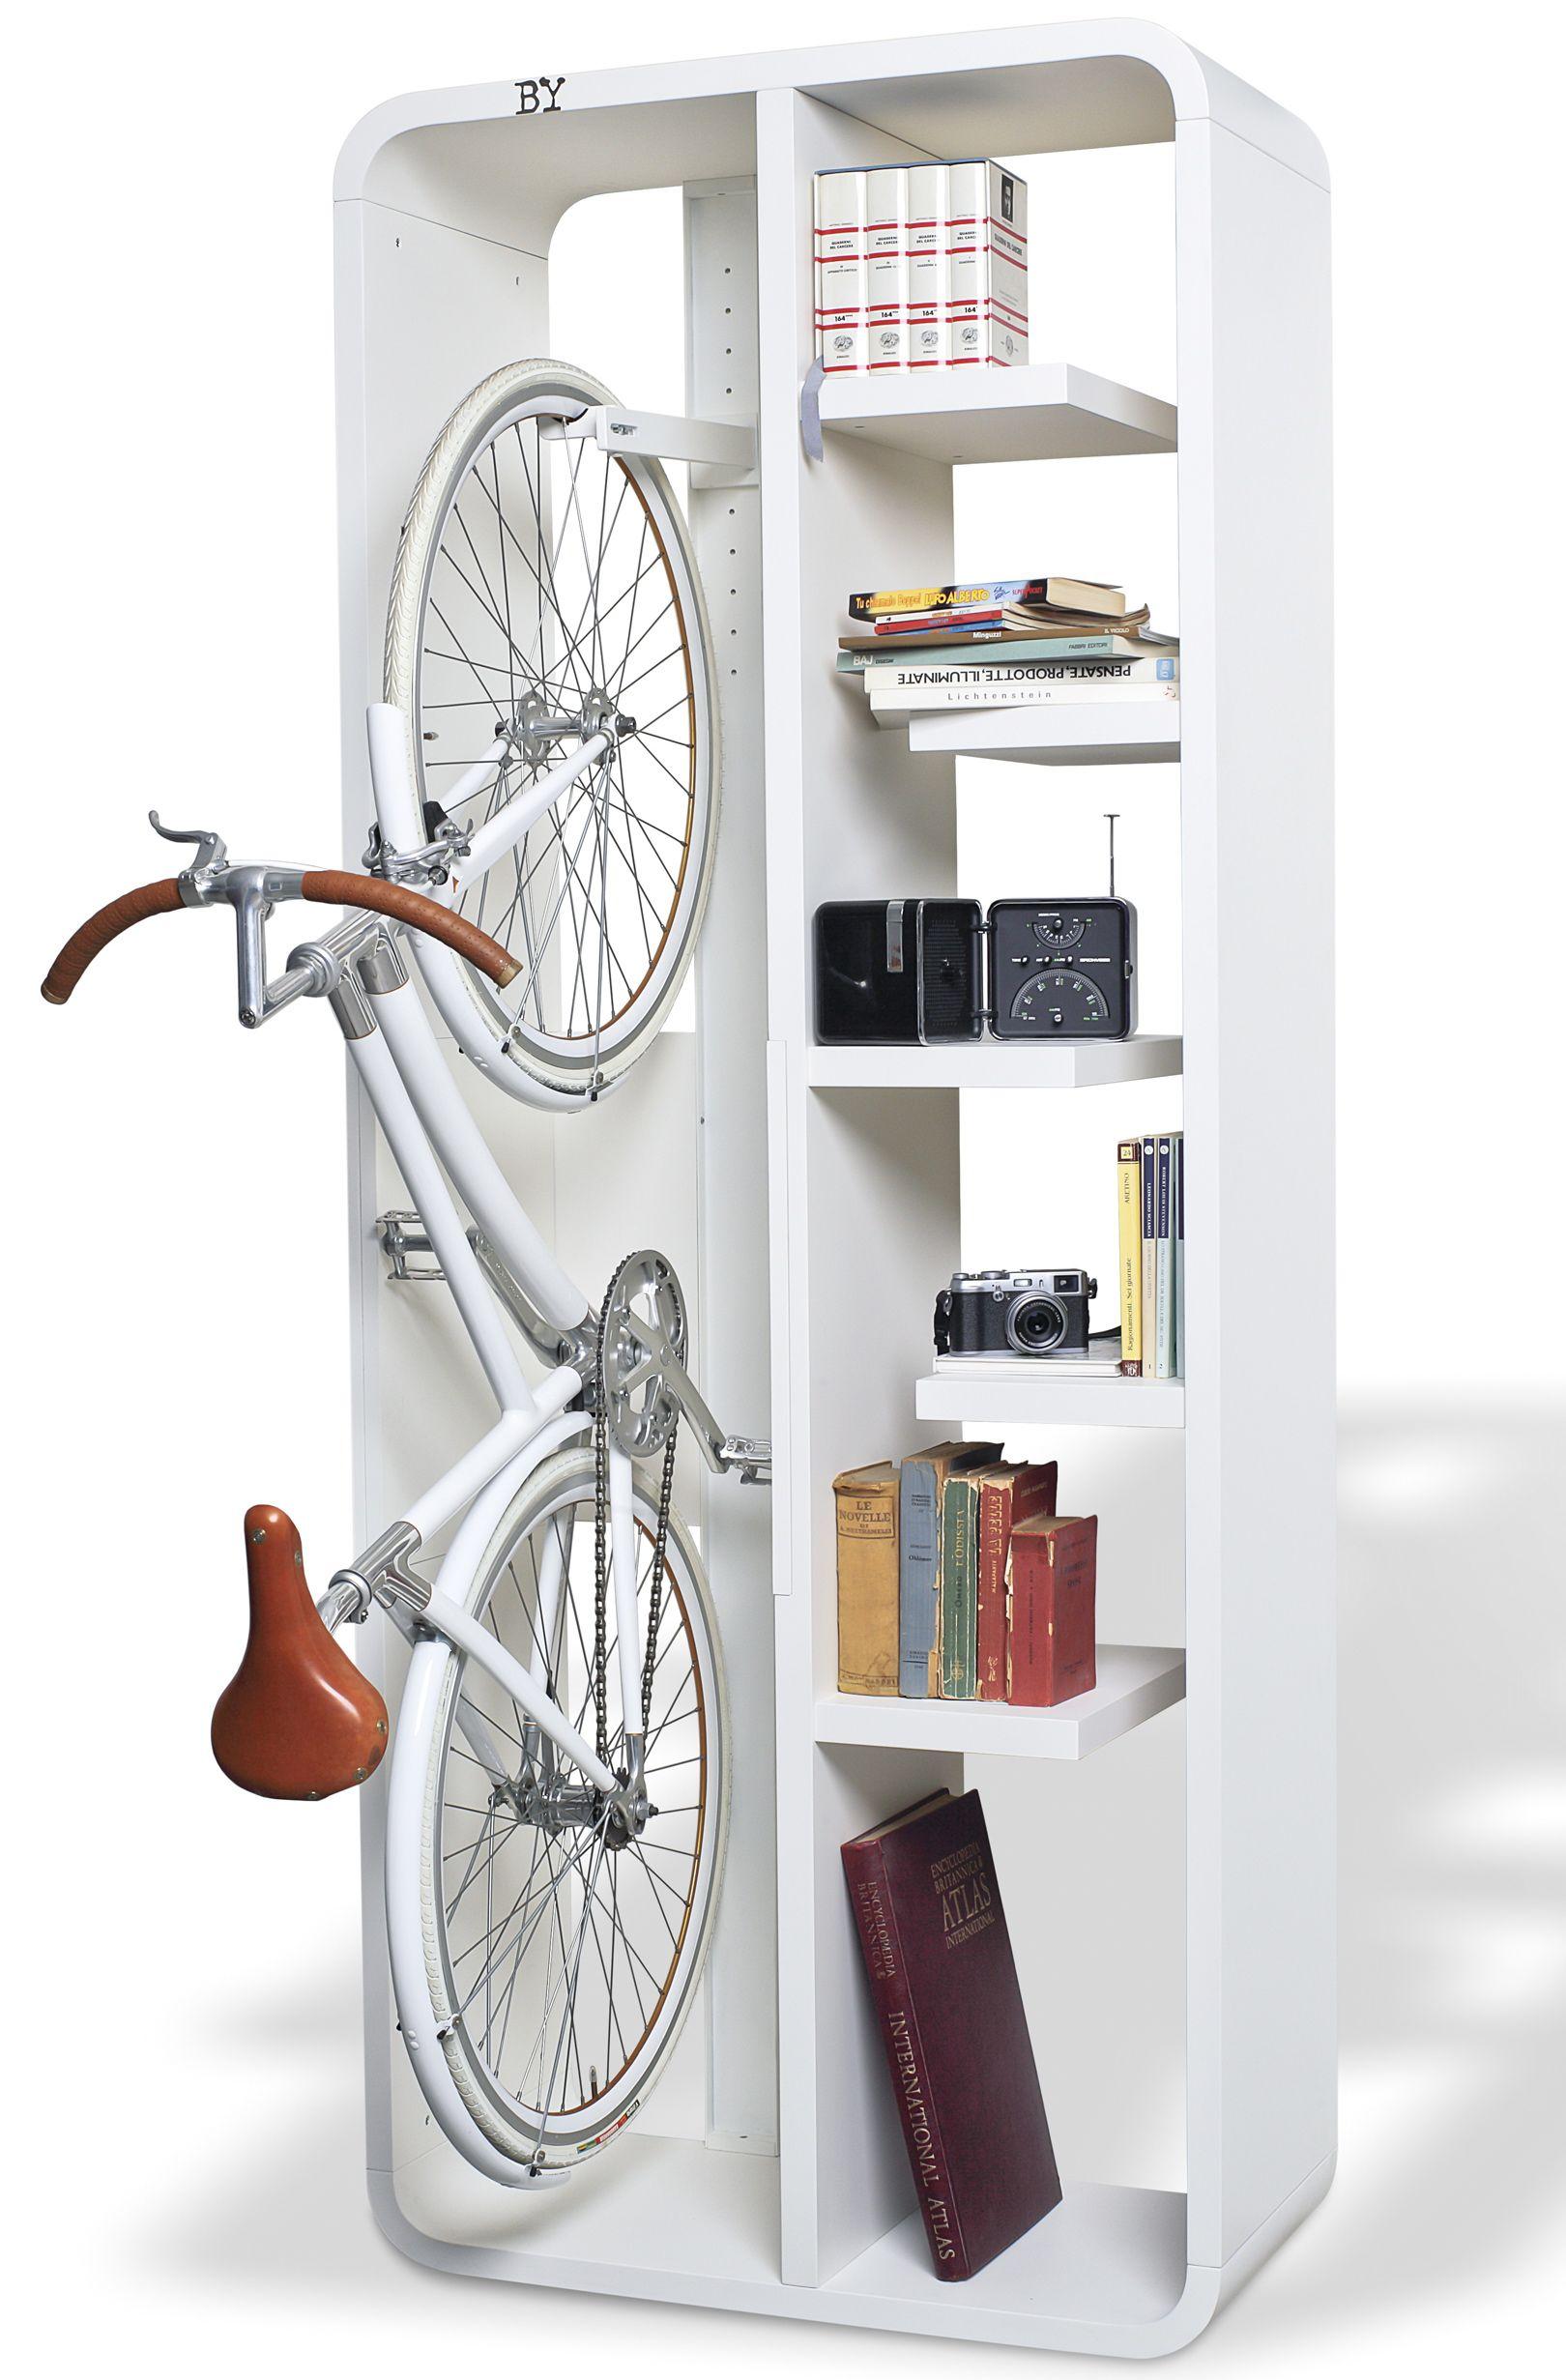 Cool Bike Storage Ideas Bicycle Carriers Hitch Bike Rack Storage ...